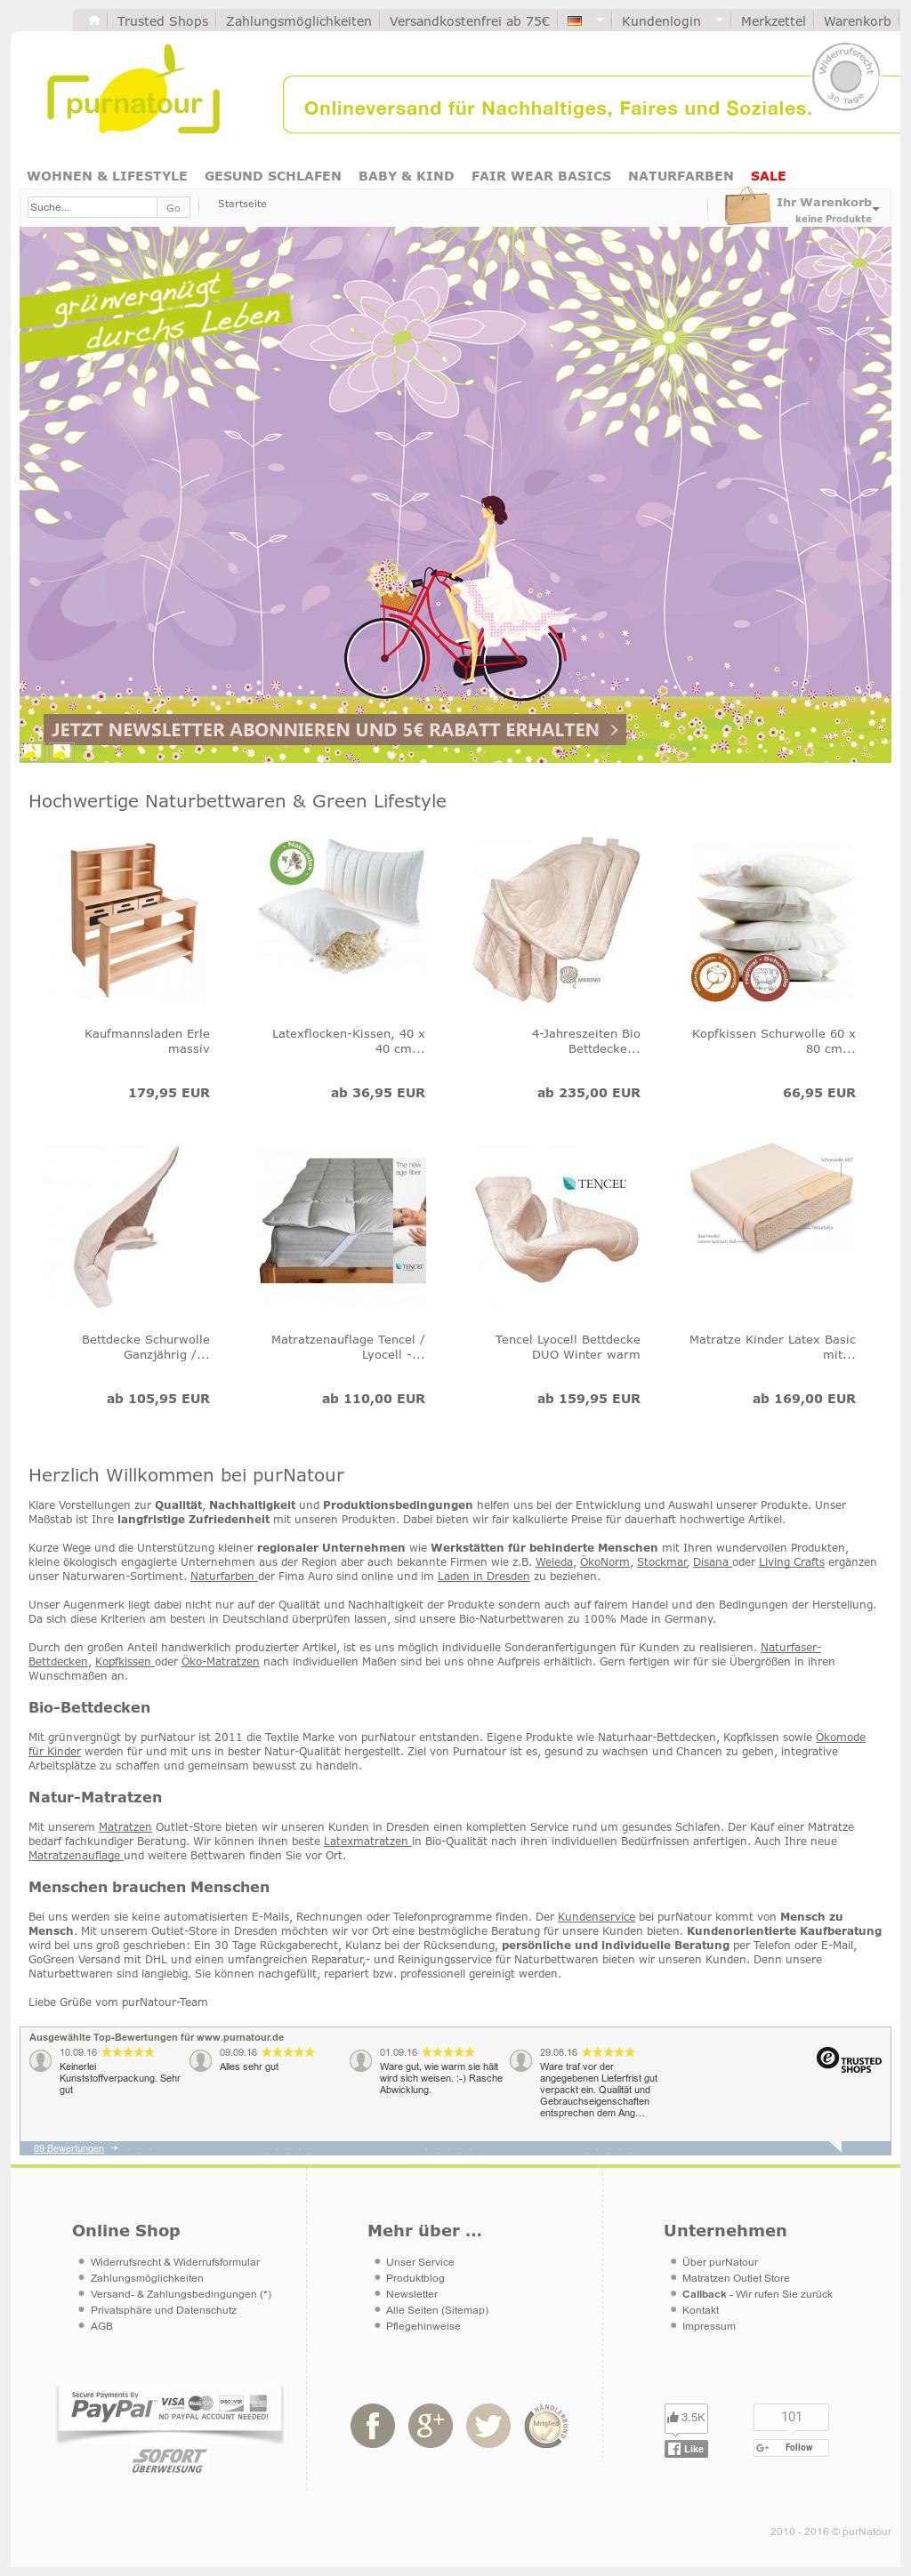 test bettdecken 2016 cooles schlafzimmer totenkopf bettw sche ideen f r farbgestaltung. Black Bedroom Furniture Sets. Home Design Ideas